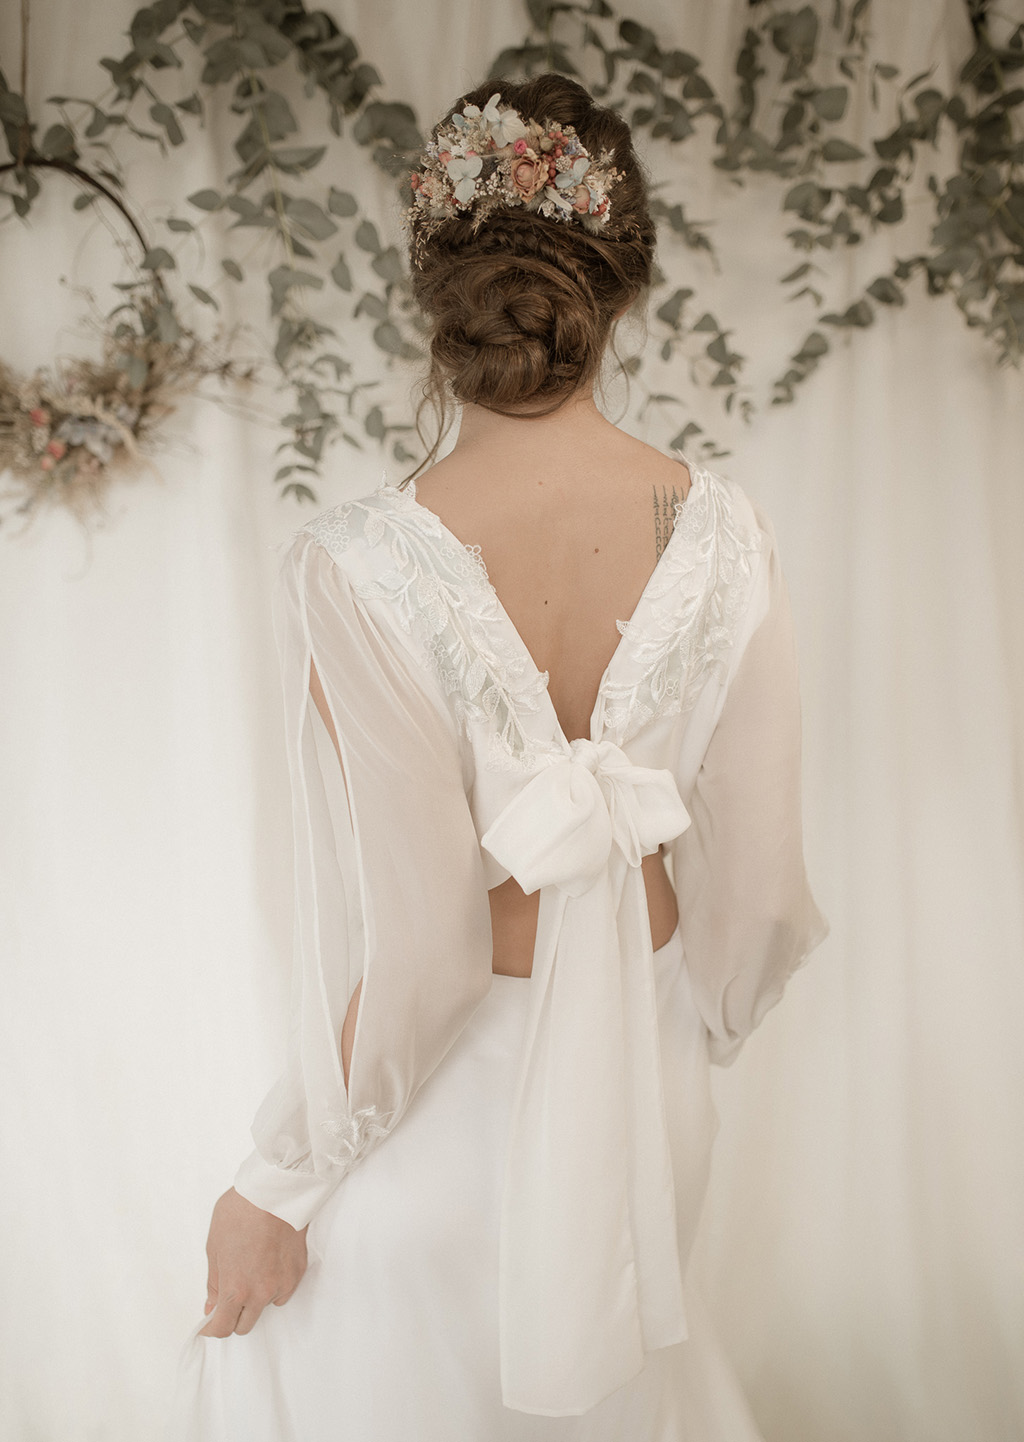 Slow bridal fashion by Jessica Turner Designs